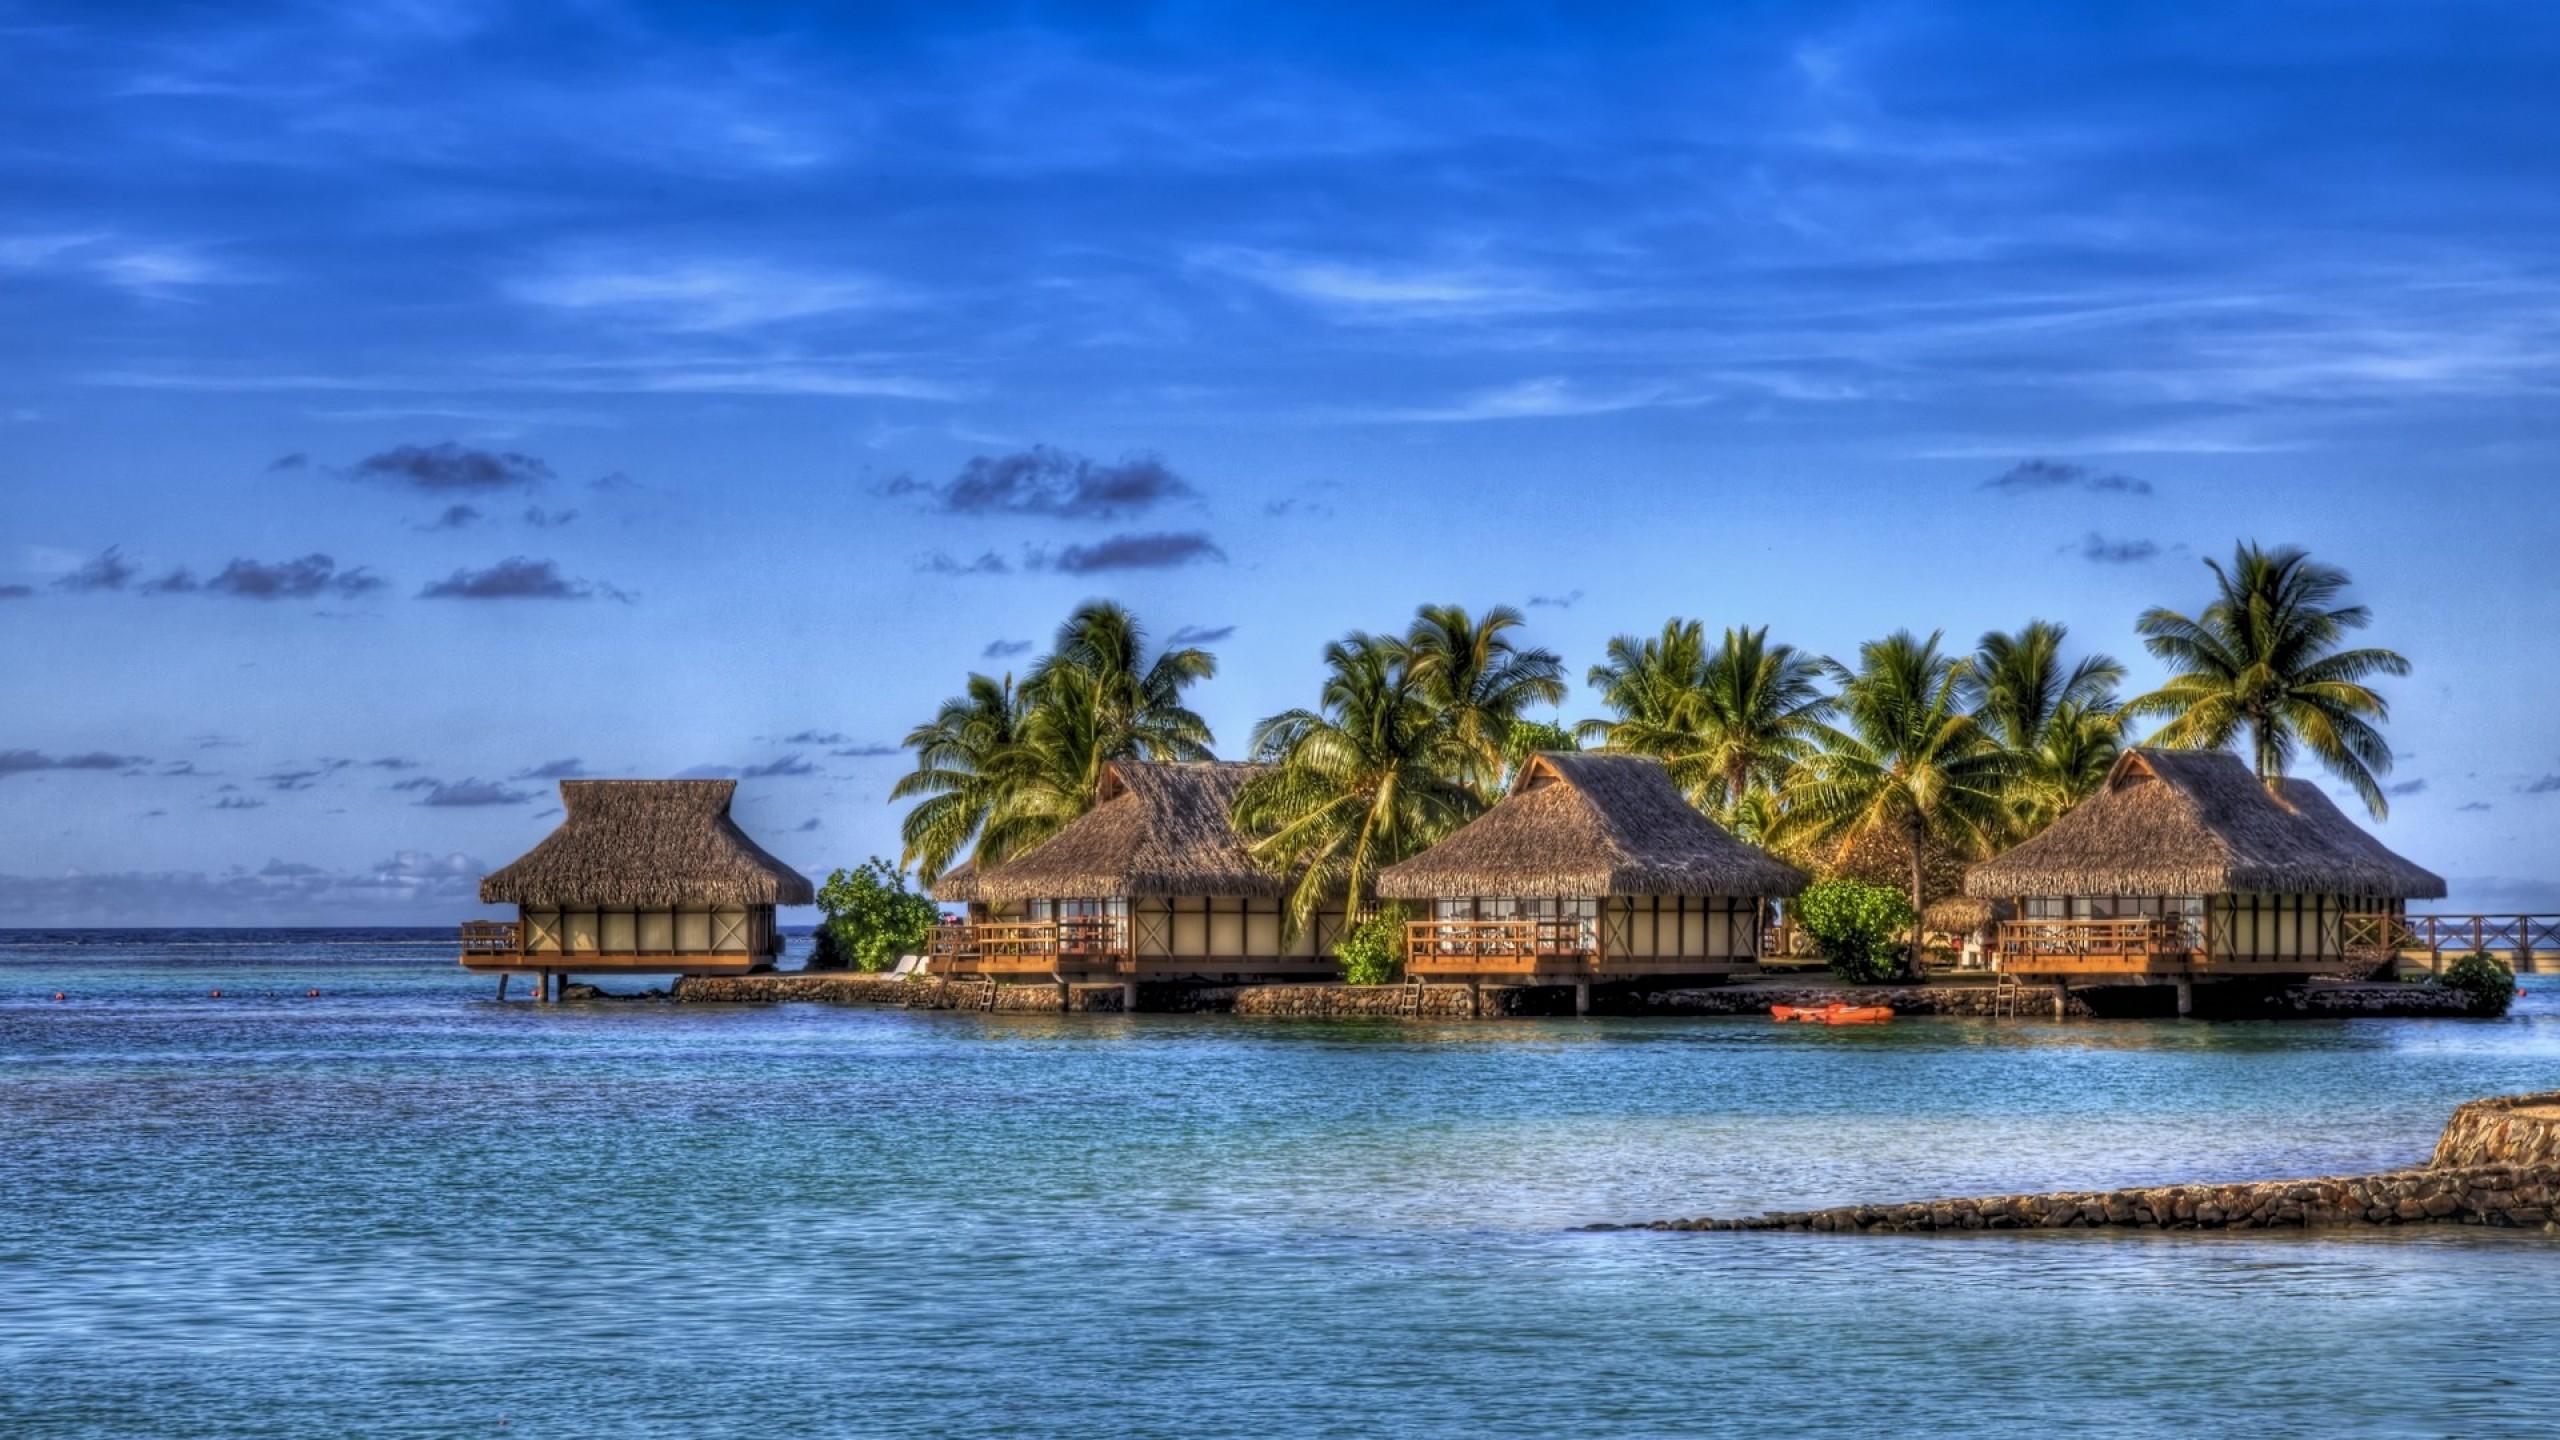 Tropical Island Beach Hd Wallpapers 2560x1440